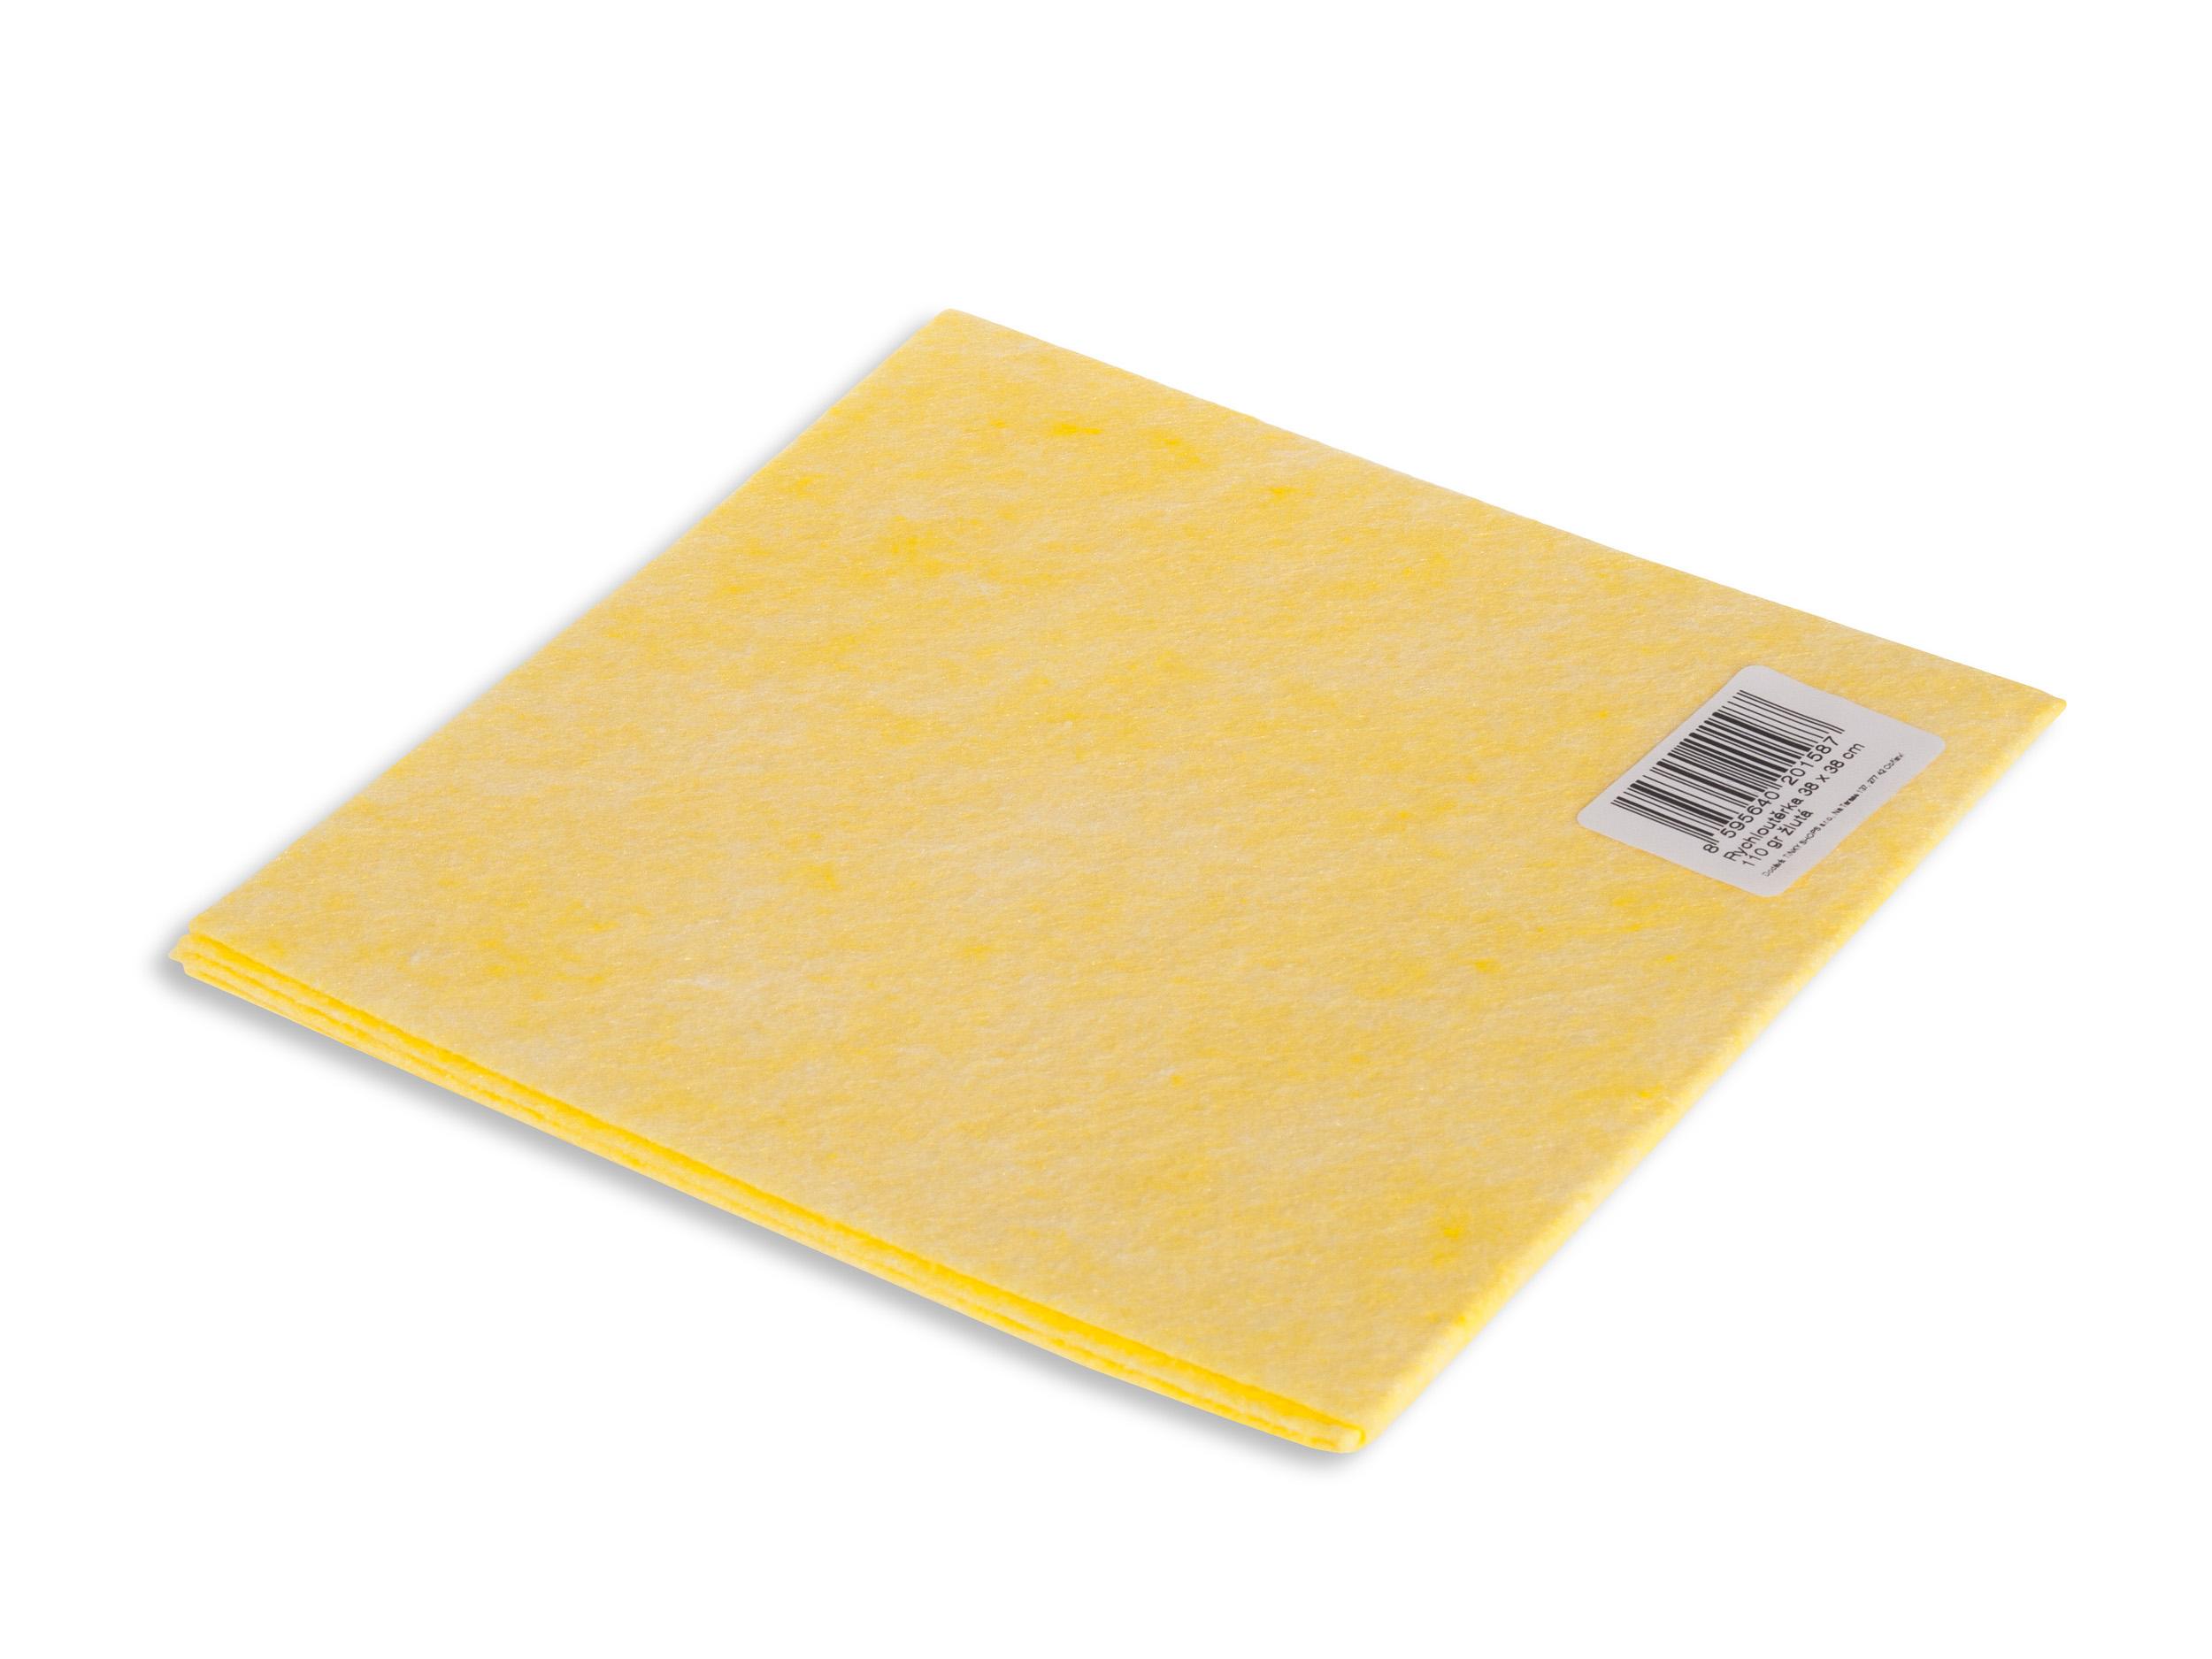 Vektex rychloutěrka 38 x 38 cm žlutá, 110 g